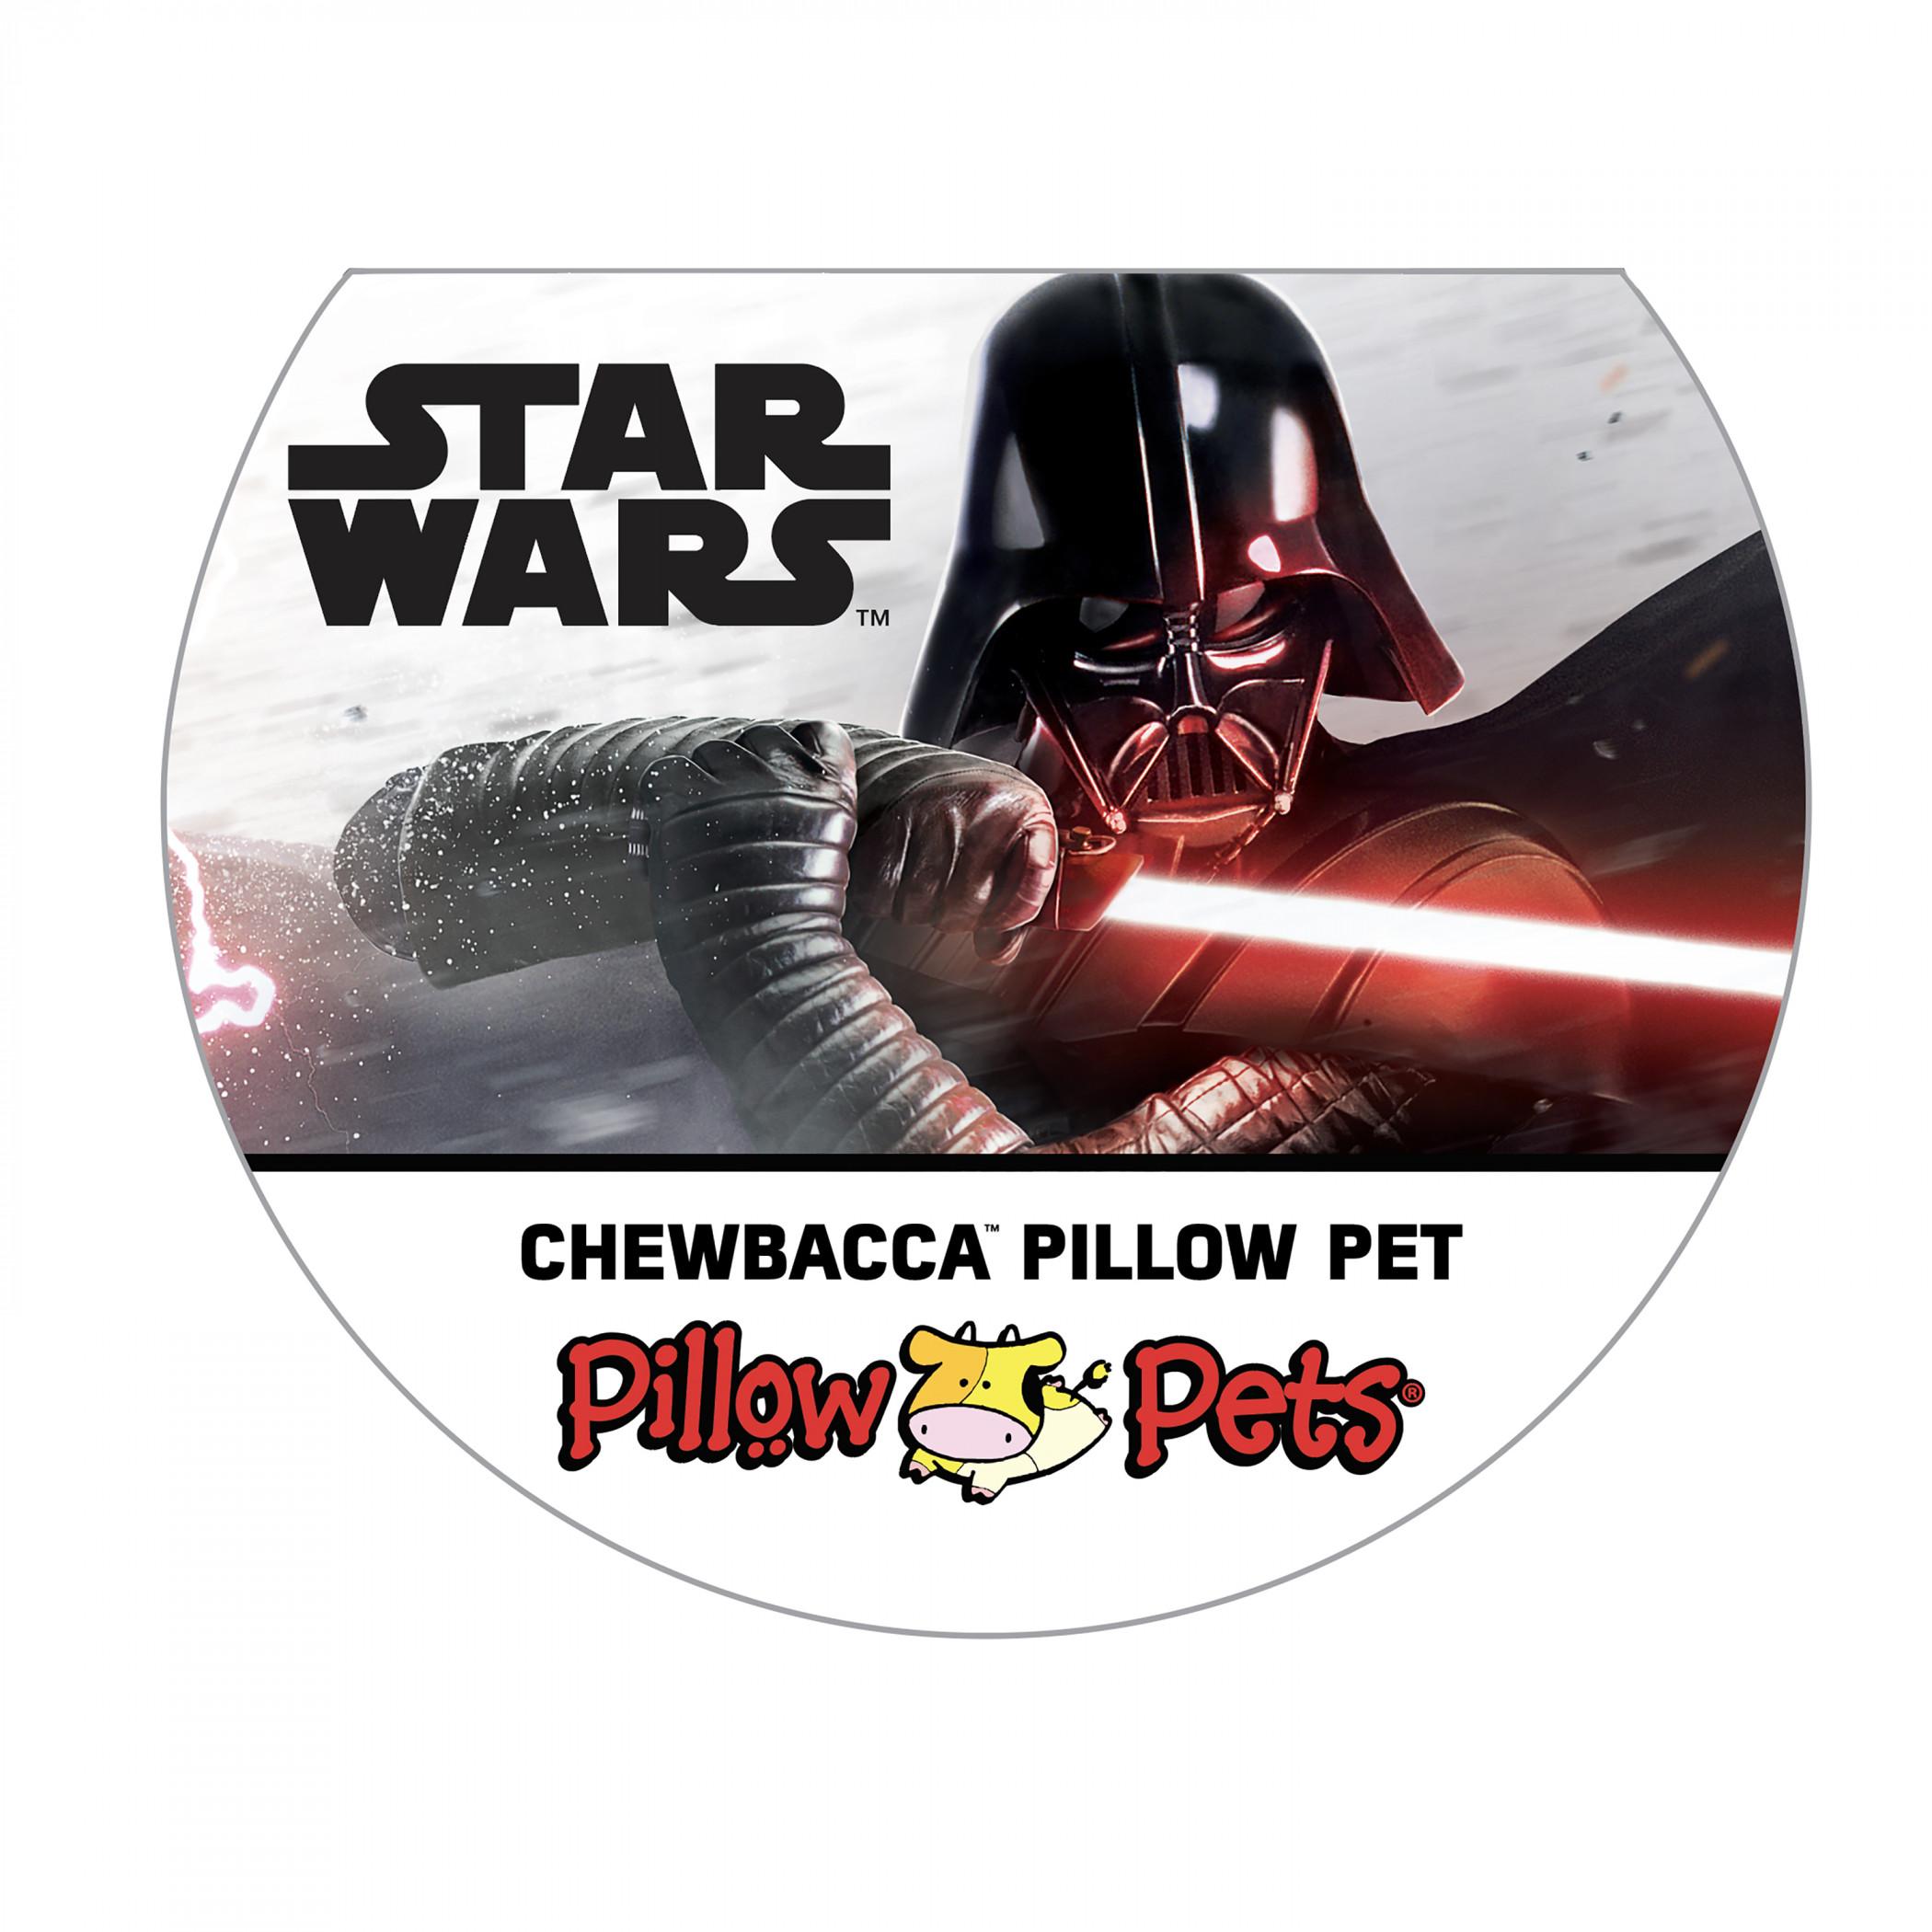 Chewy Pillow Pet - Star Wars Chewbacca Stuffed Animal Plush Toy